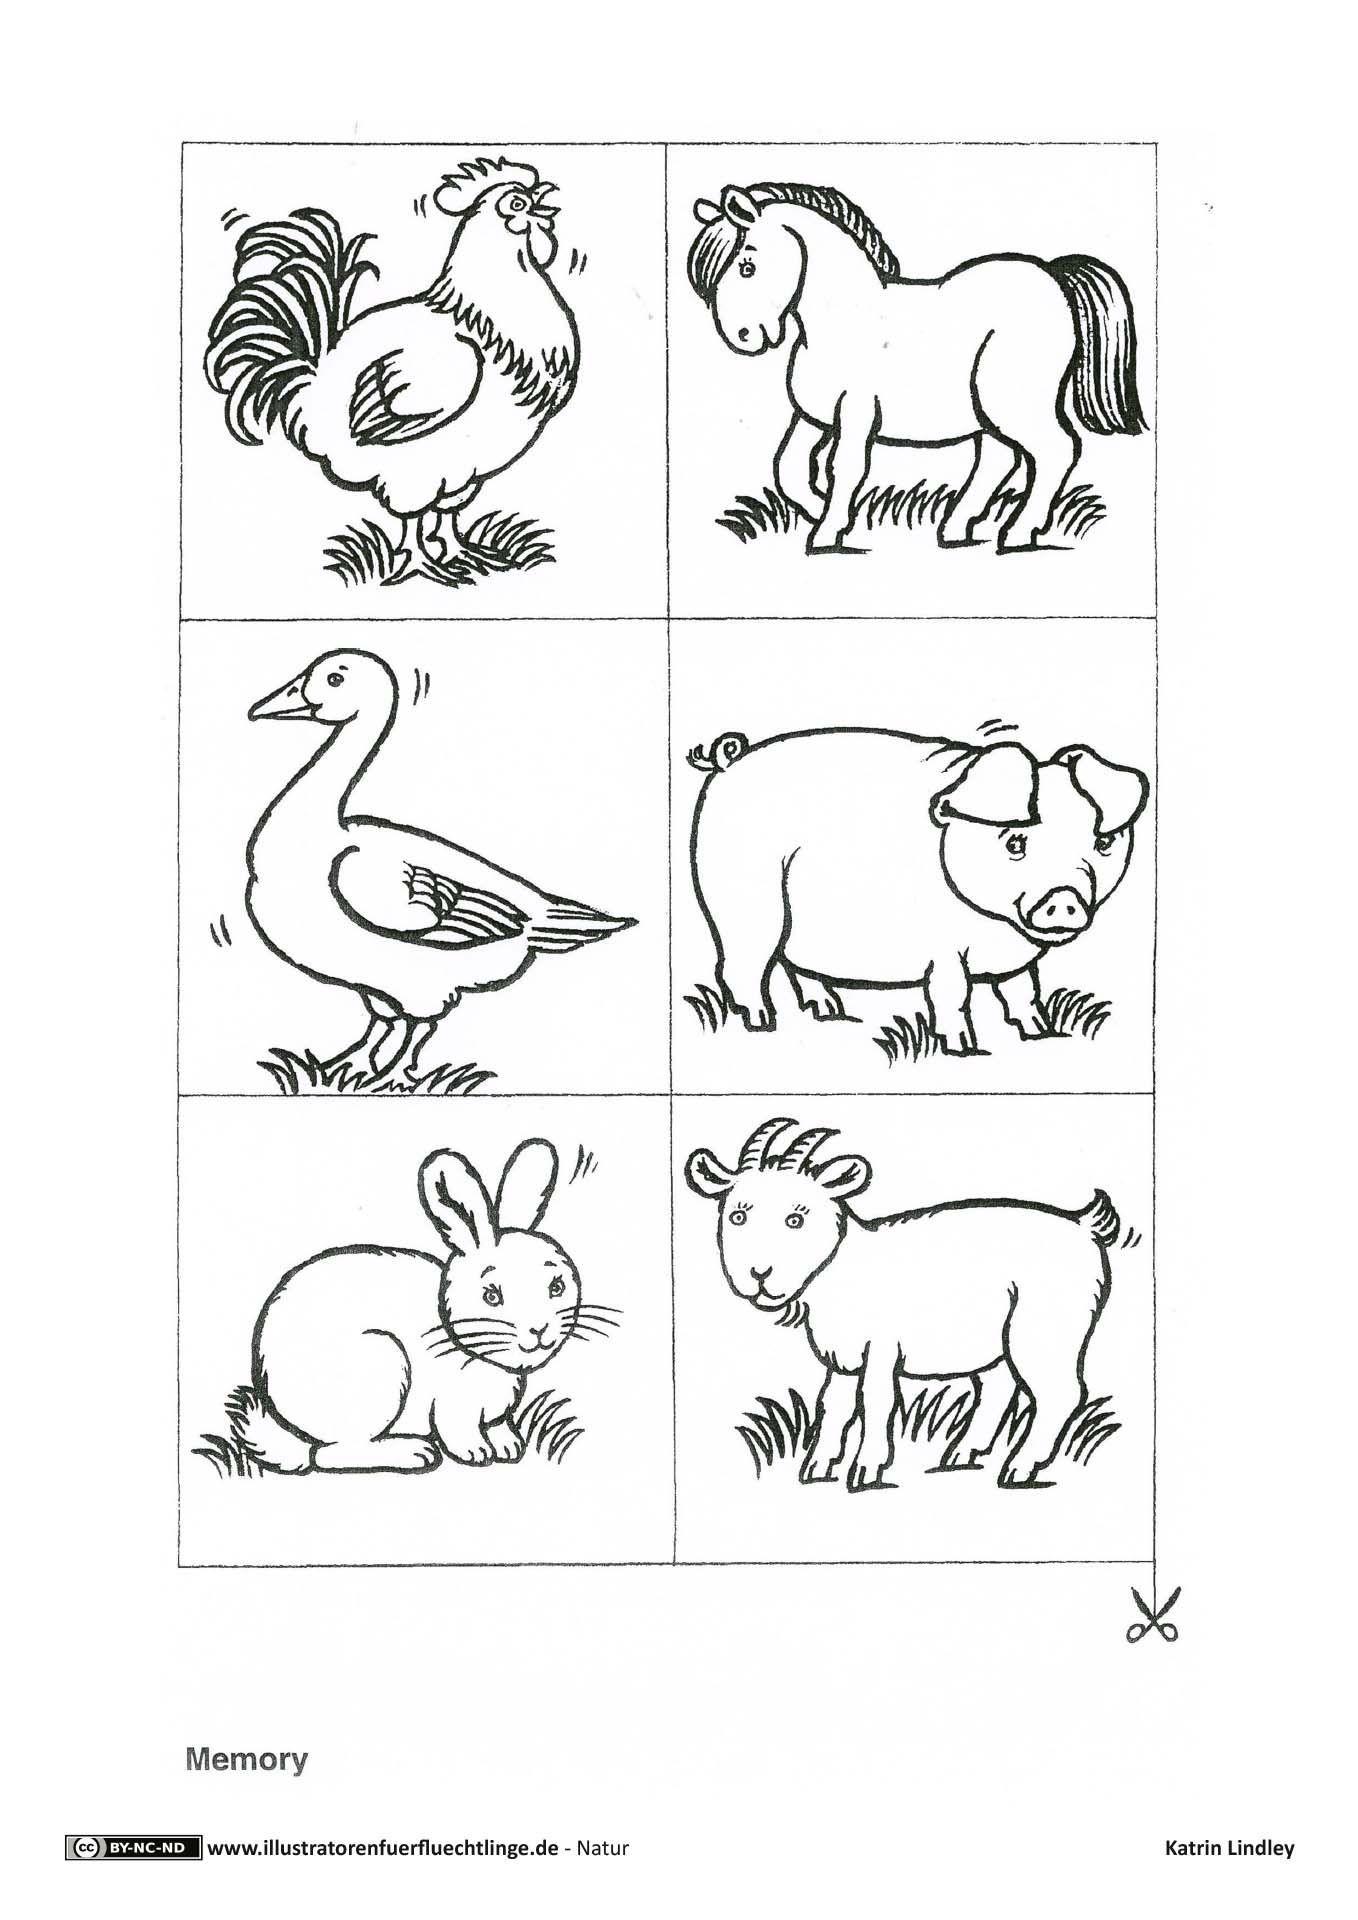 Download Als Pdf 2 Seiten Natur Bauernhof Tiere Memory Lindley Specialeducation Farm Animals Farm Animal Coloring Pages Farm Animals Preschool